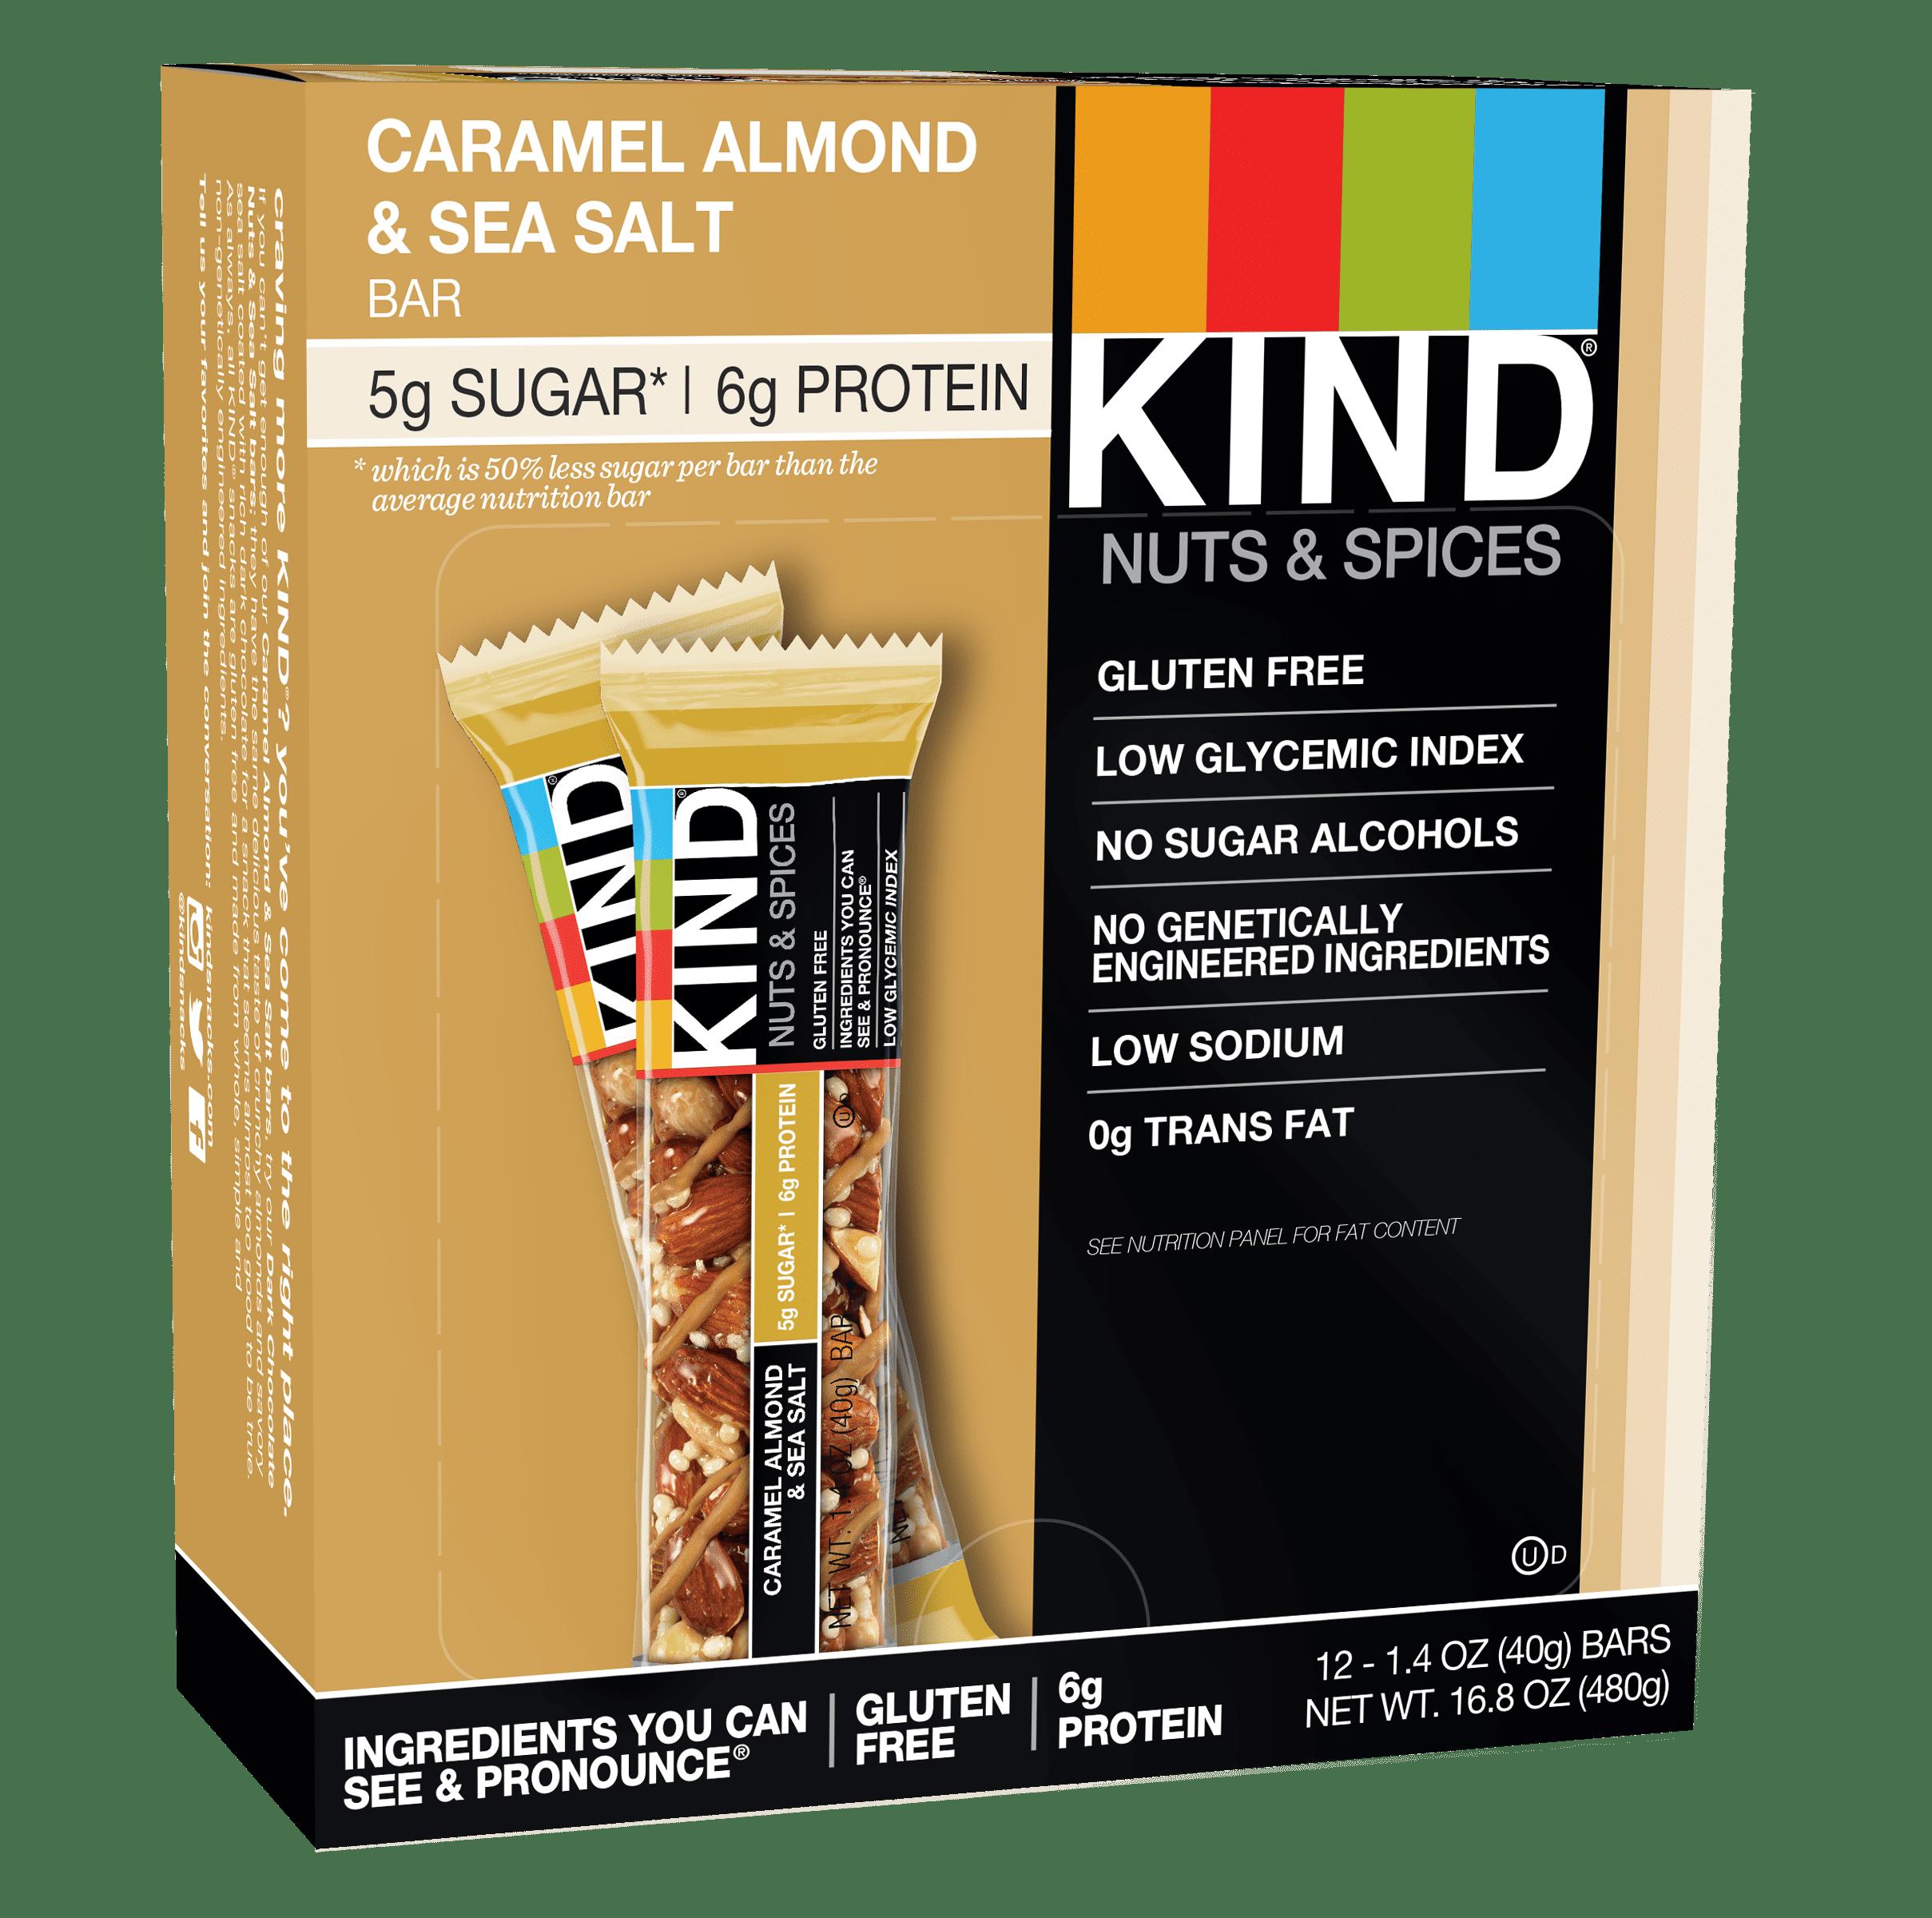 KIND Bars, Caramel Almond & Sea Salt, 12 Bars, Gluten Free